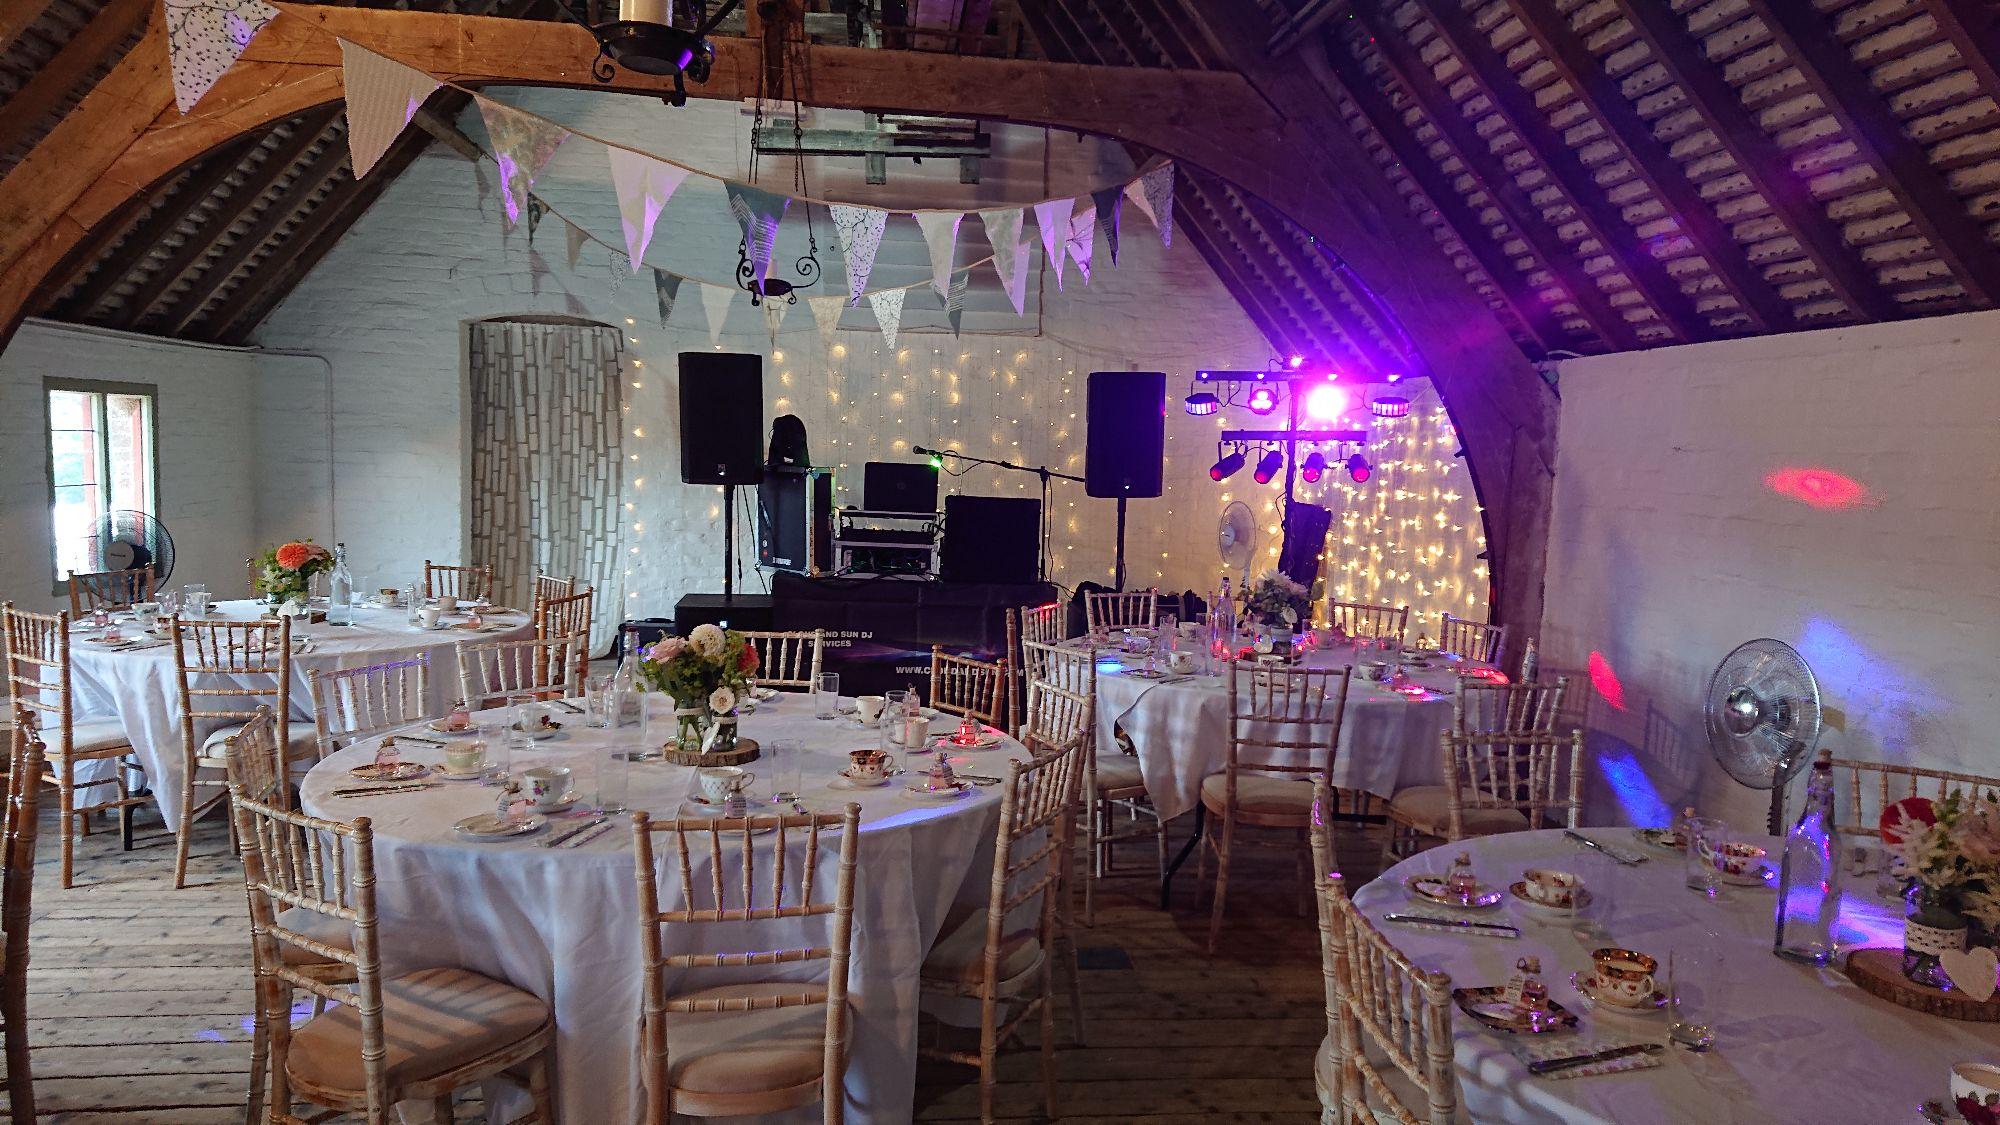 South Stoke Farm arundel Sussex - Beautiful venue